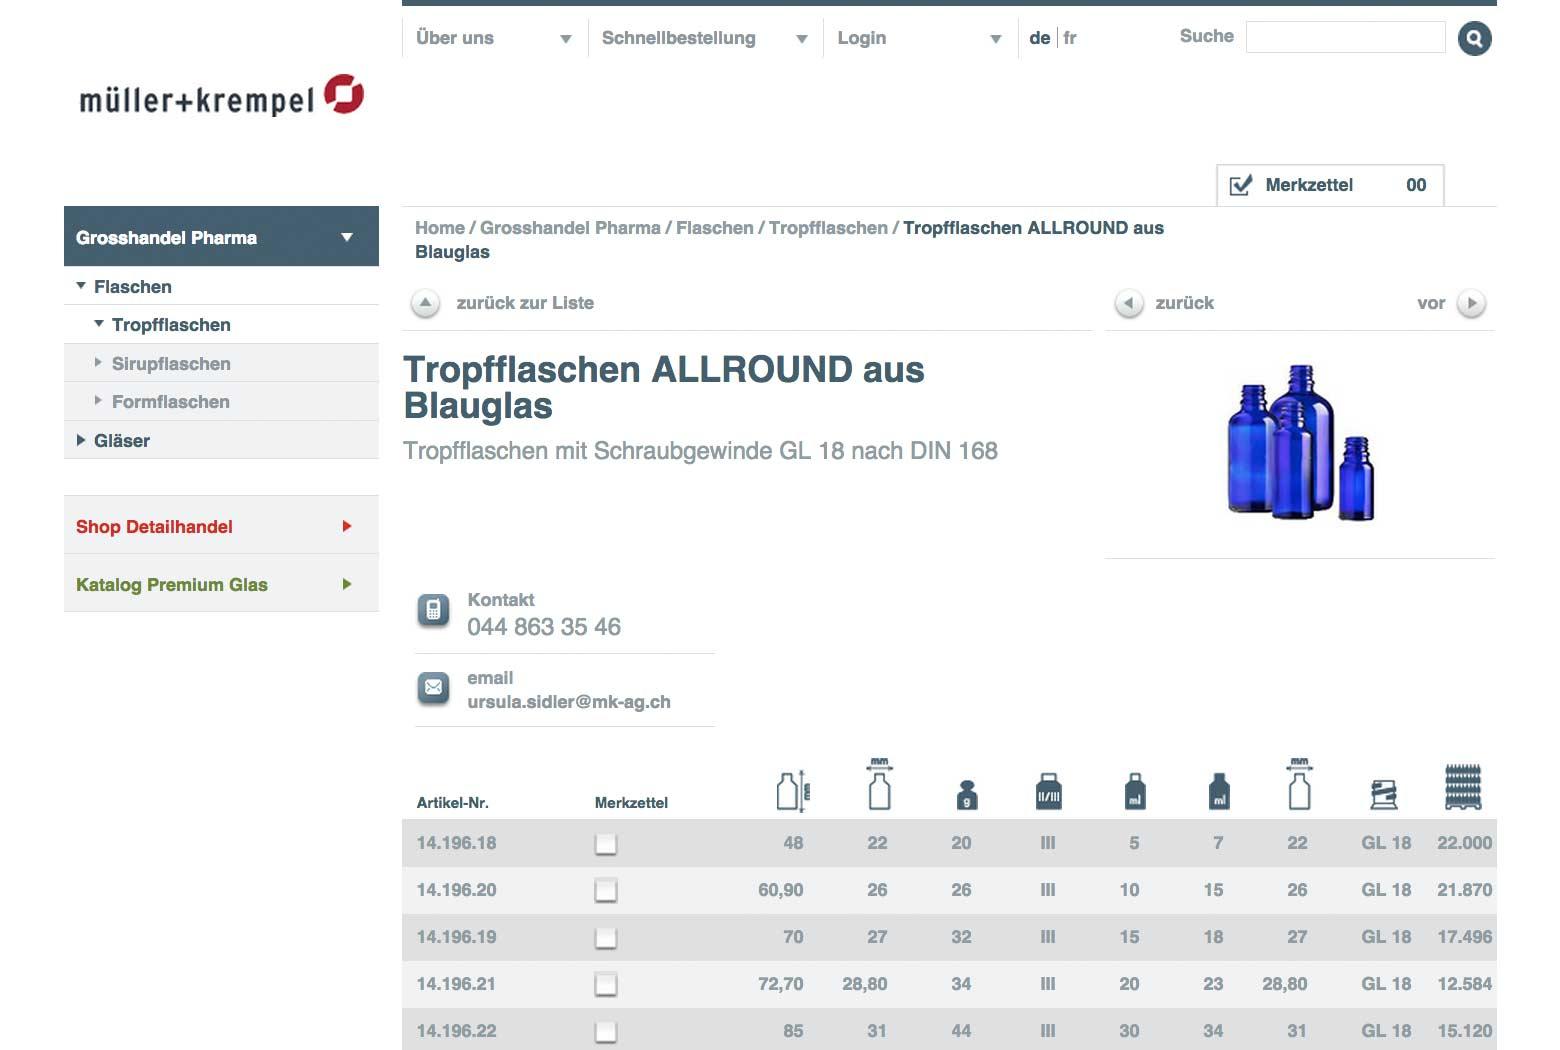 E-Business Webseite für Müller + Krempel slide 4